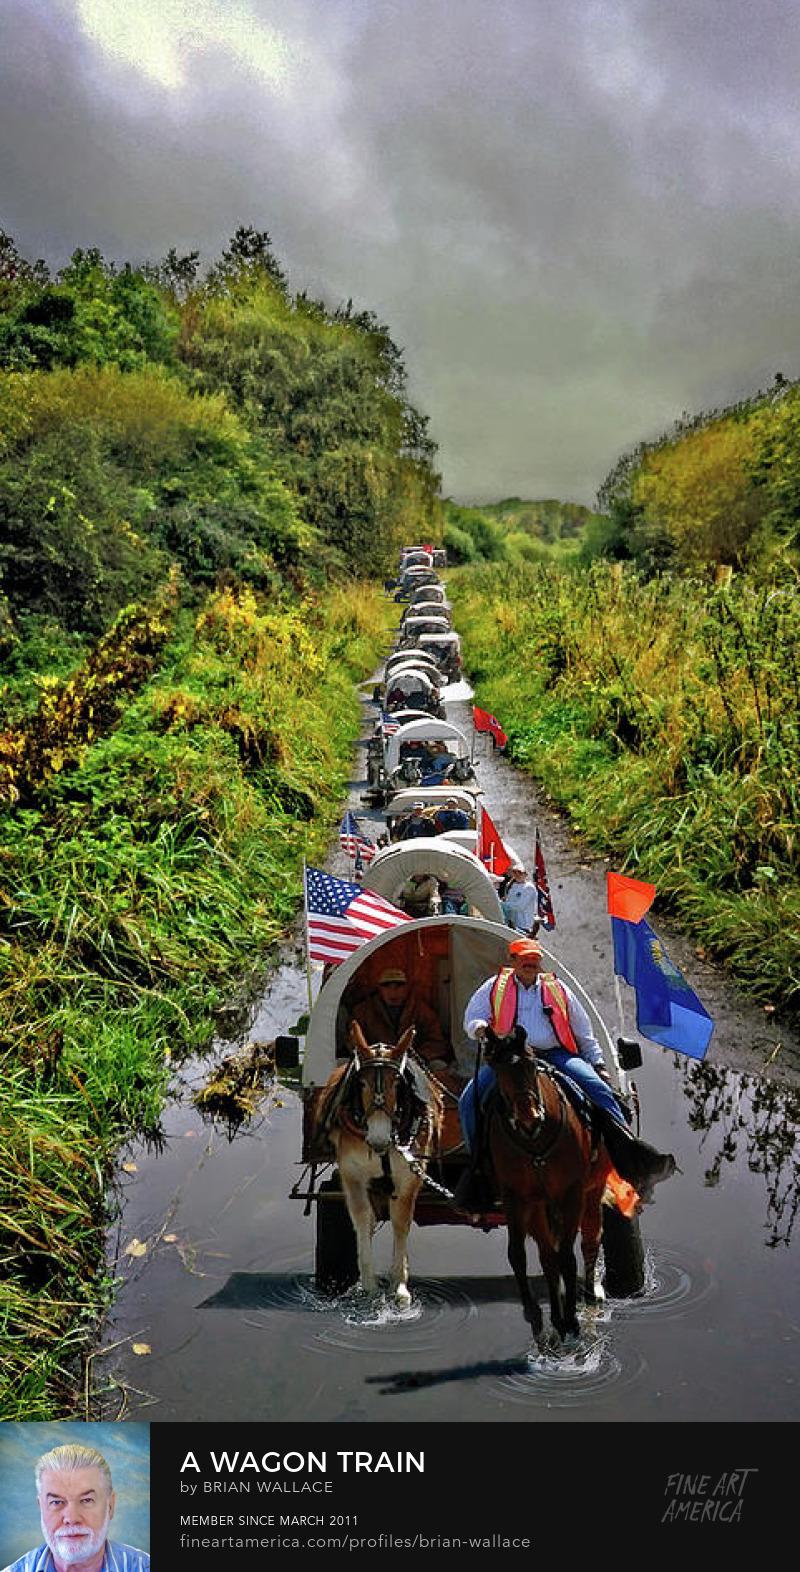 A Wagon Train by Brian Wallace